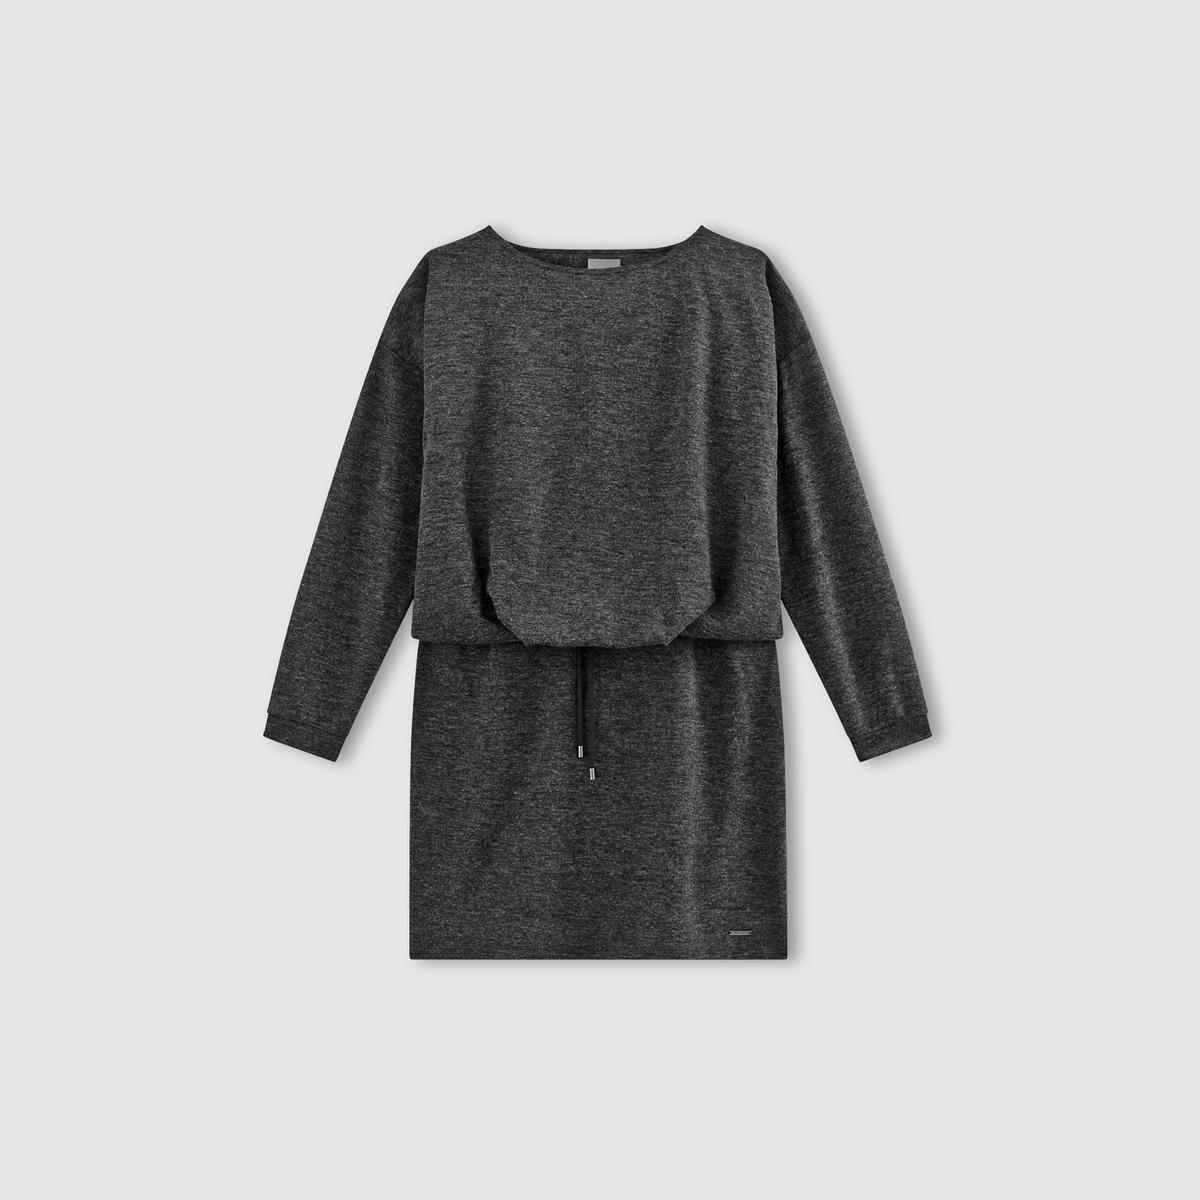 Платье меланж с длинными рукавами, VMNORAСостав и описаниеМарка : VERO MODA.Модель : VMNORA Материал : 80% полиэстера, 15% вискозы, 5% эластана.<br><br>Цвет: темно-серый<br>Размер: M.XS